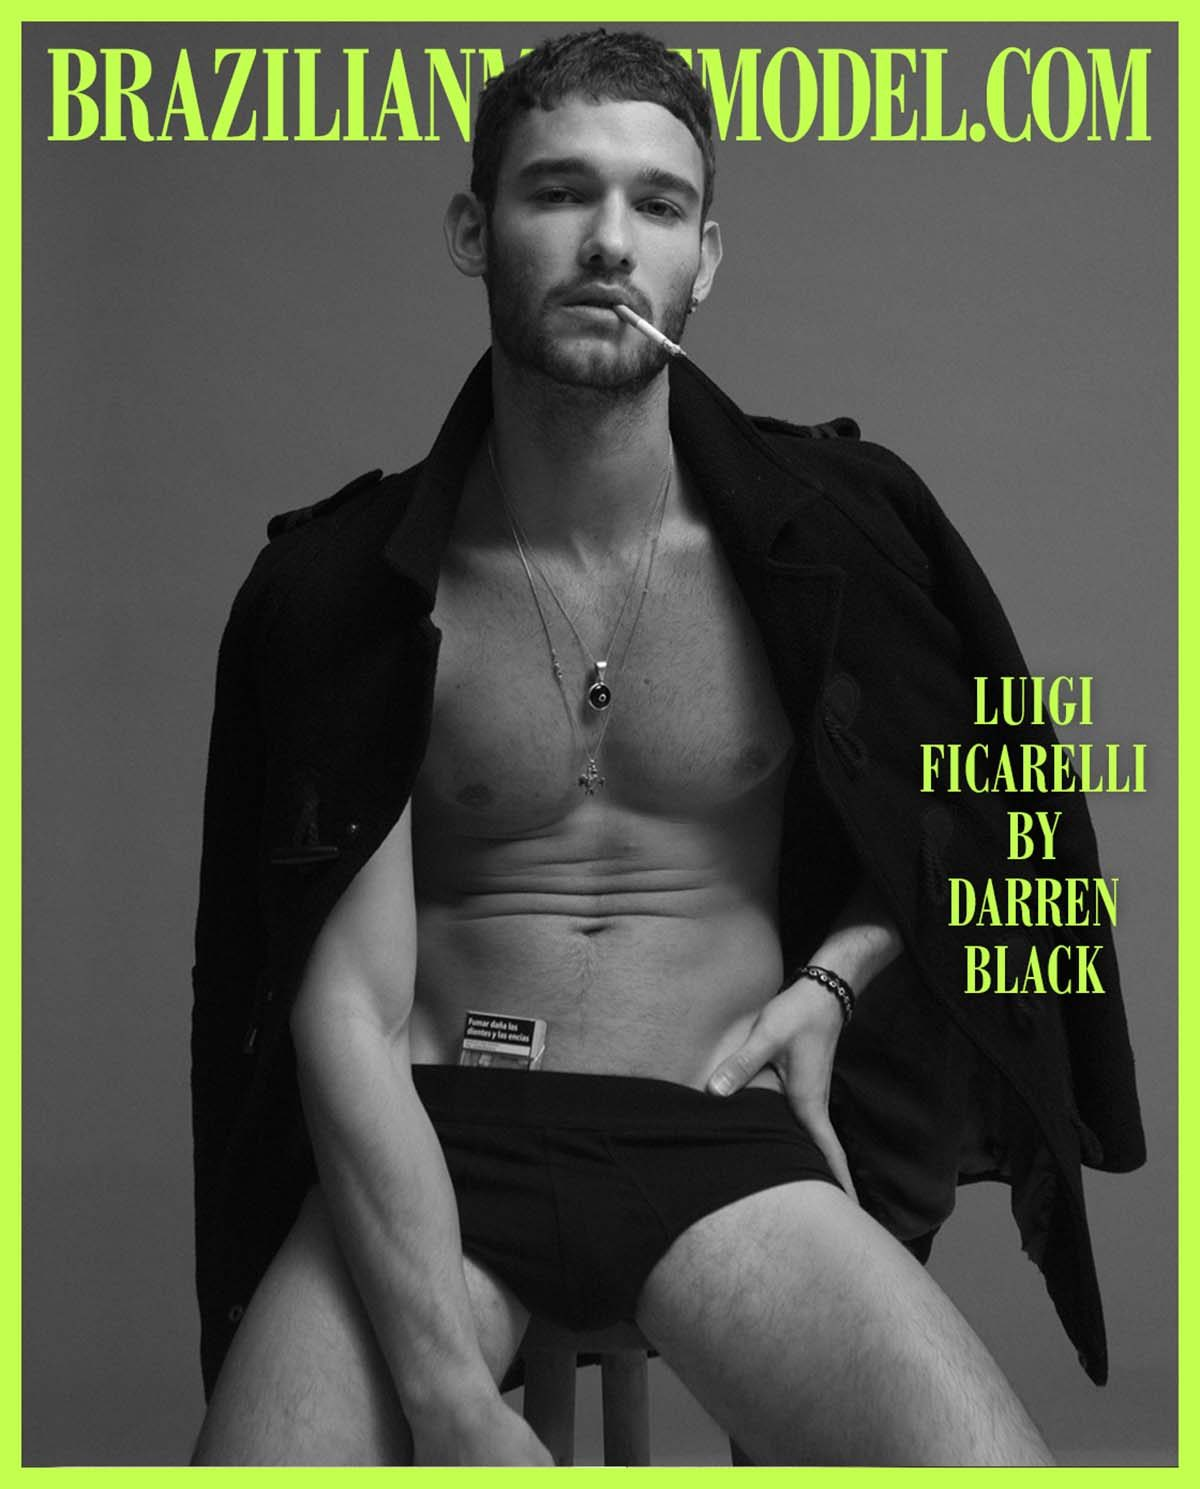 Luigi Ficarelli by Darren Black